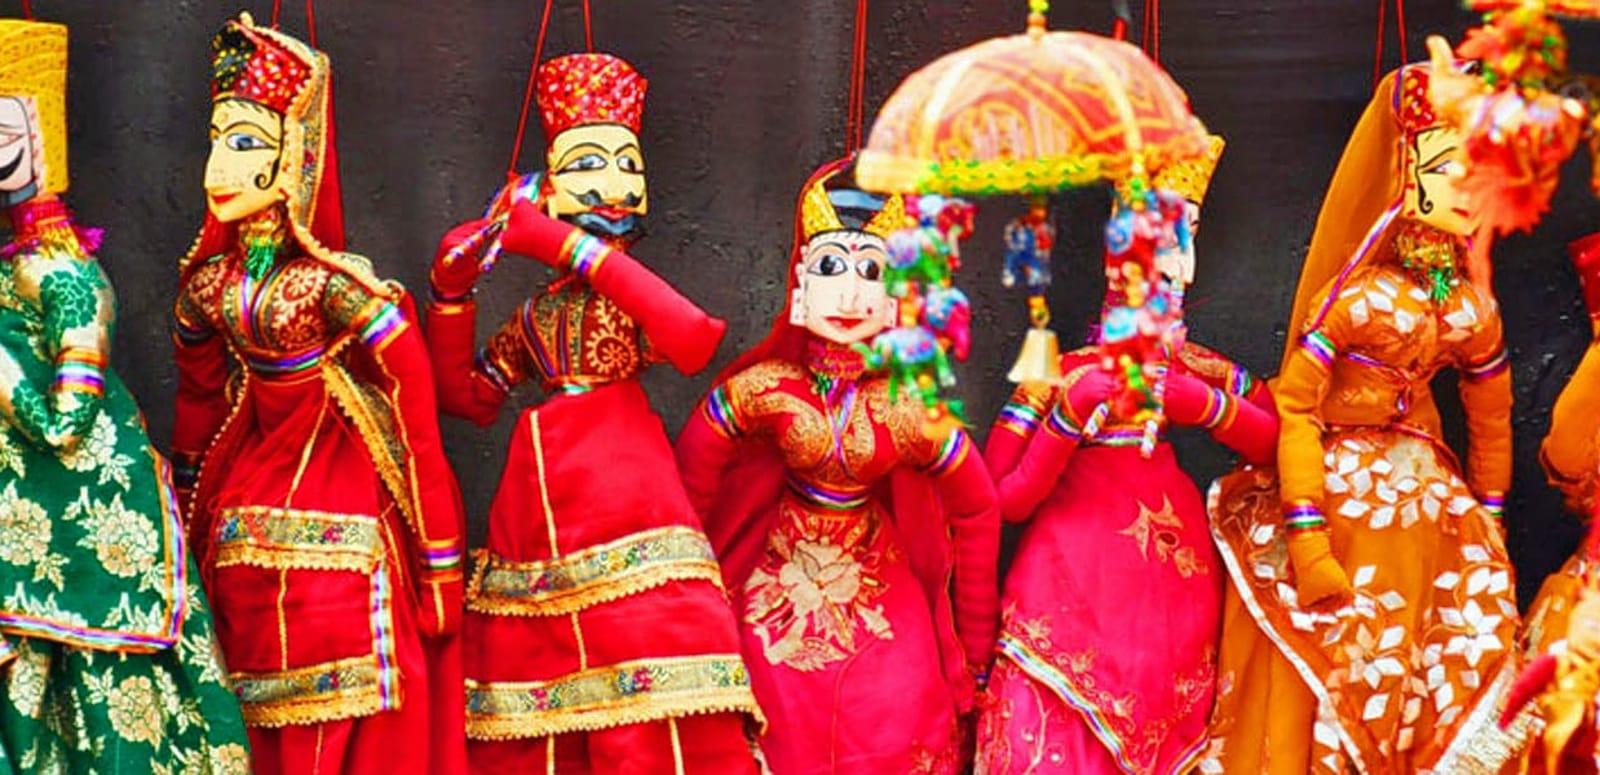 e2165760e39b 1510824627 celebration-popular-fair-and-festivals-of-rajasthan.jpg